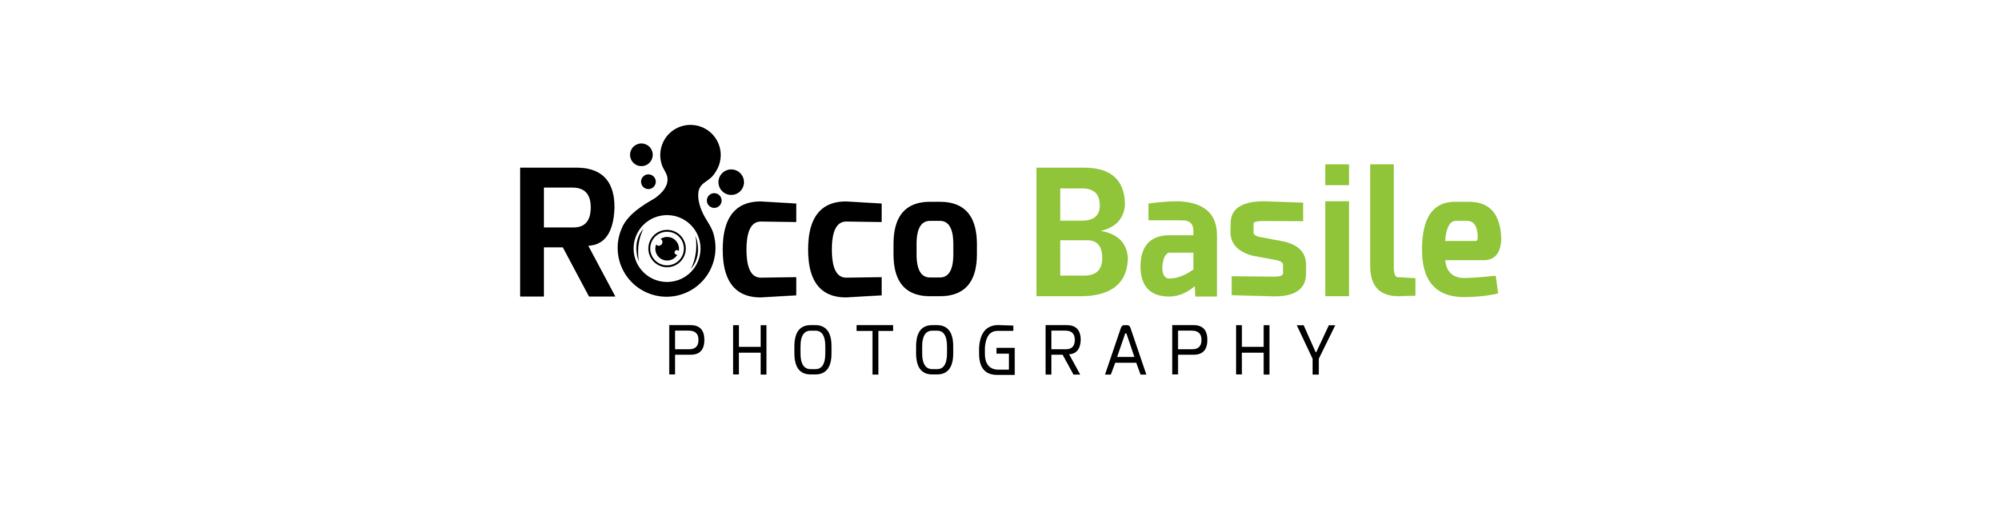 Rocco Basile Photography